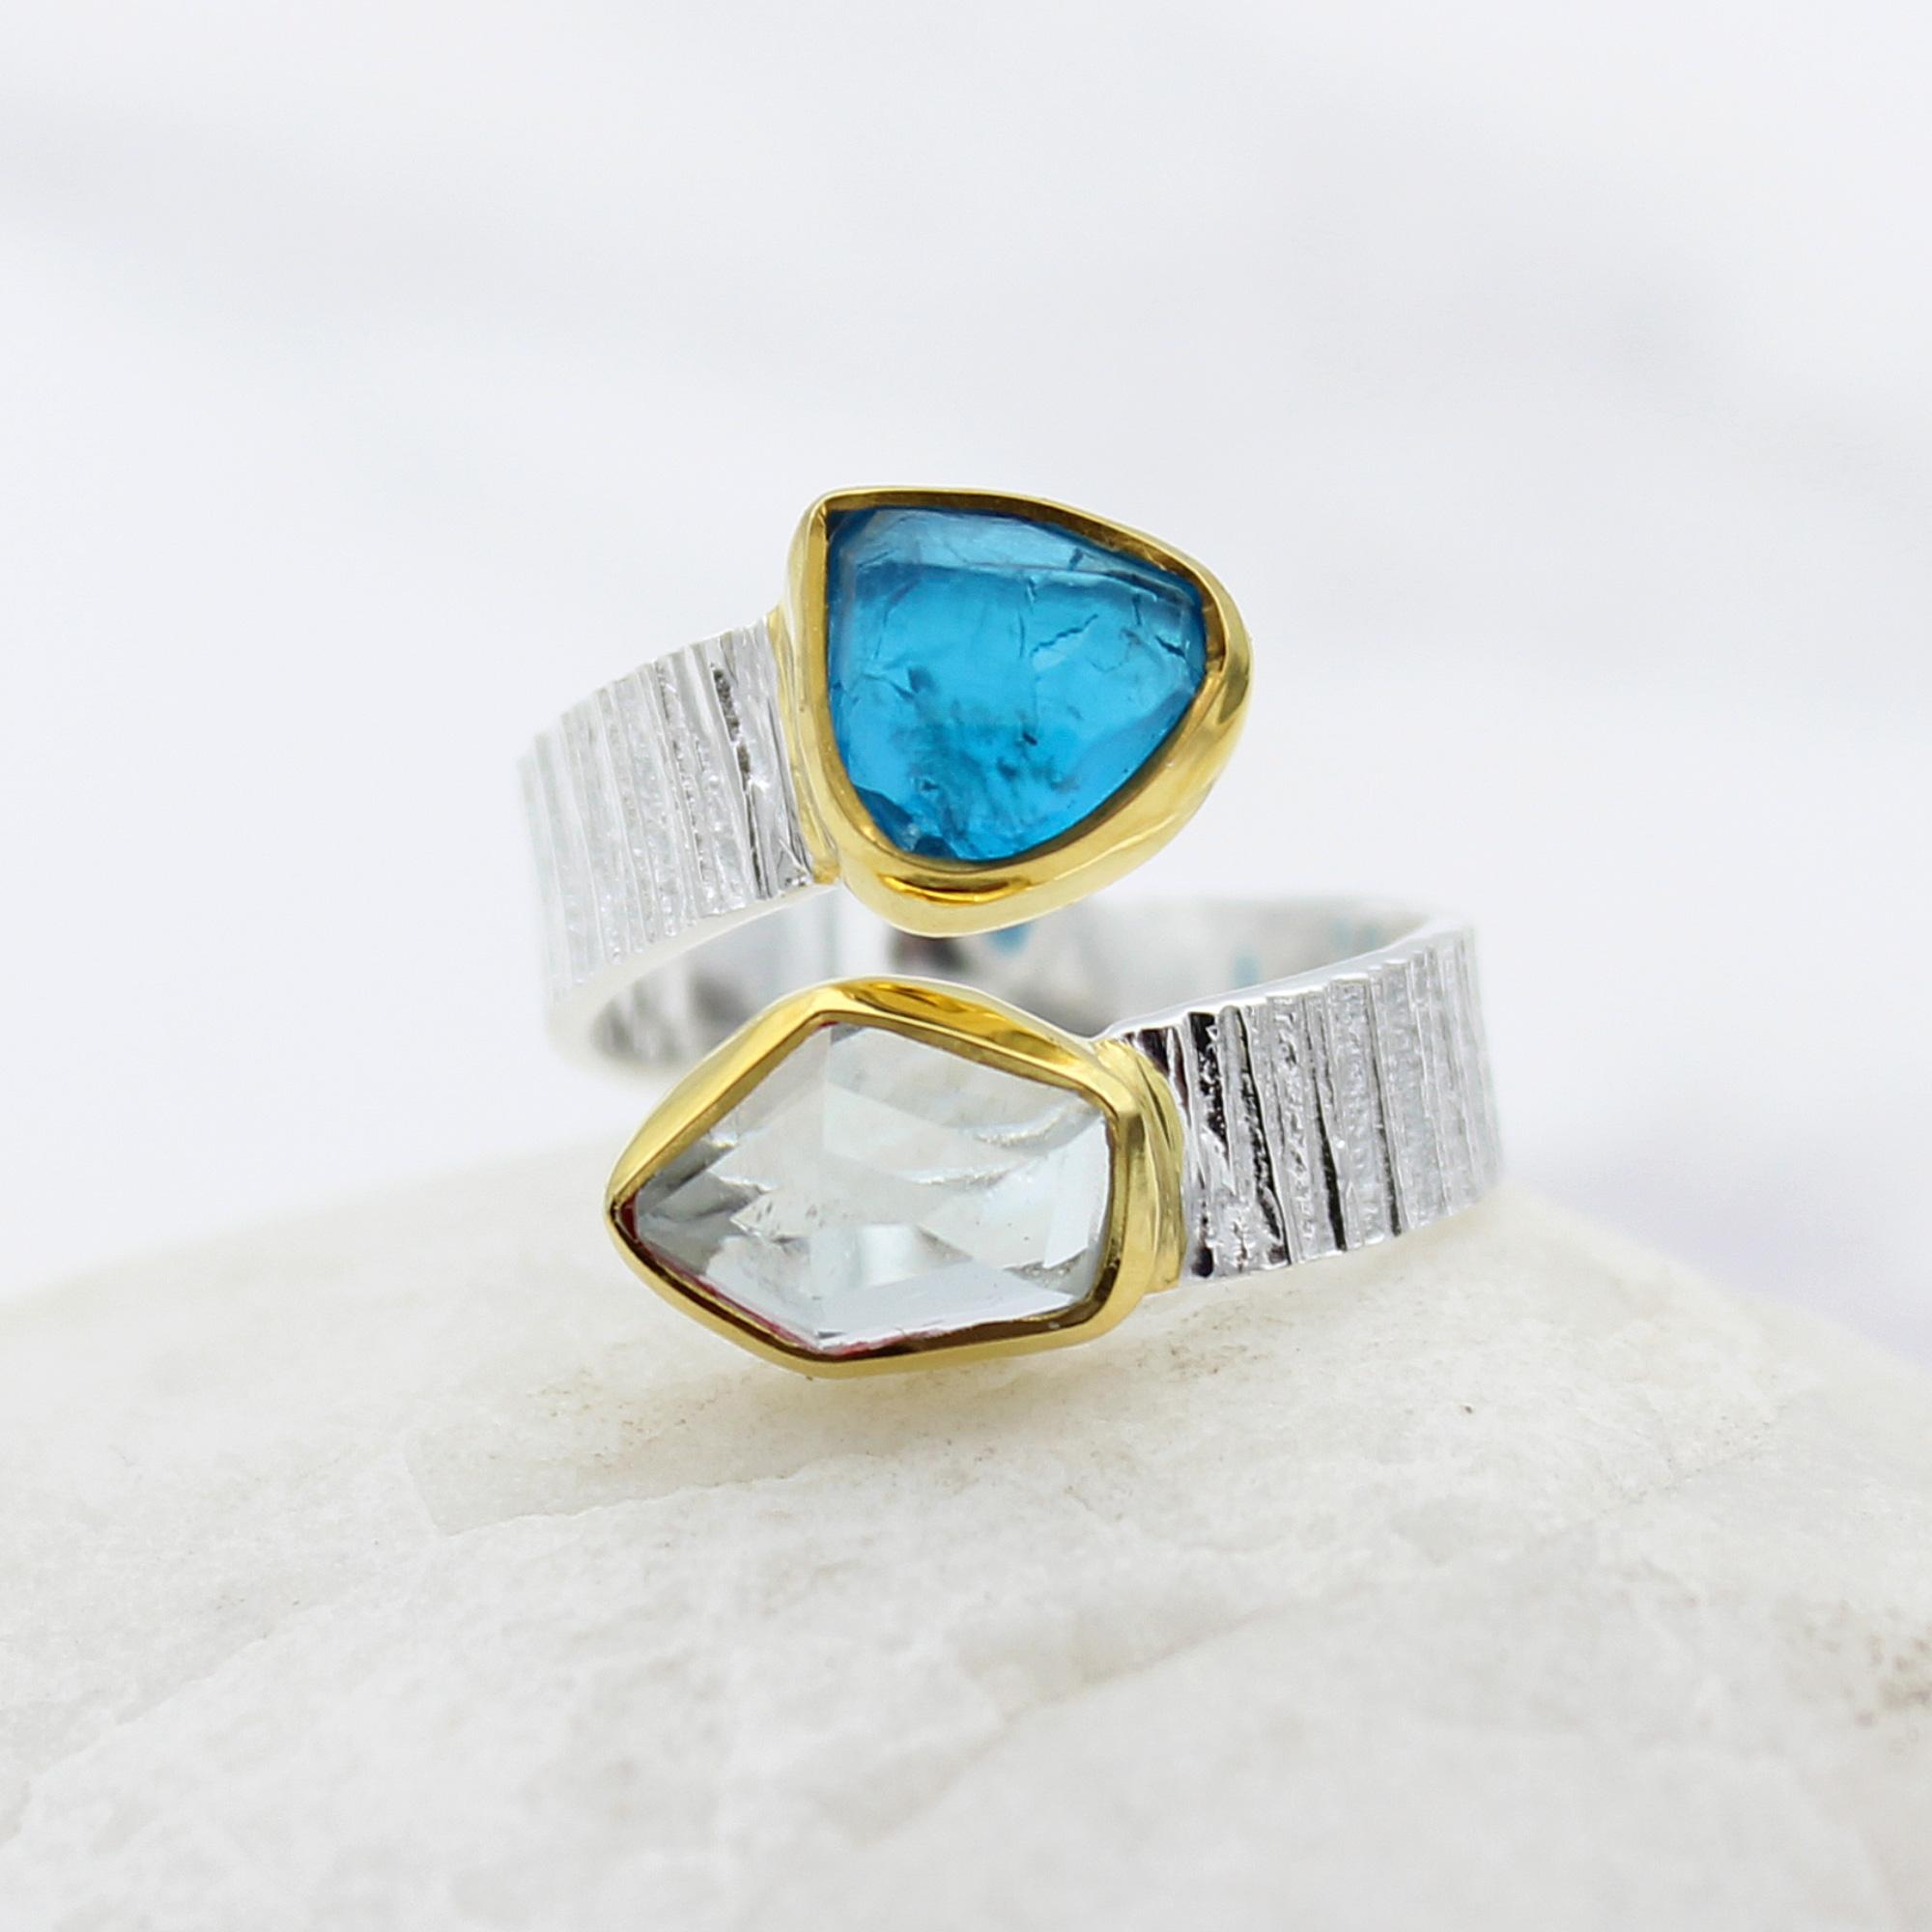 Aquamarine and Apatite Gemstone Adjustable Sterling Silver Ring